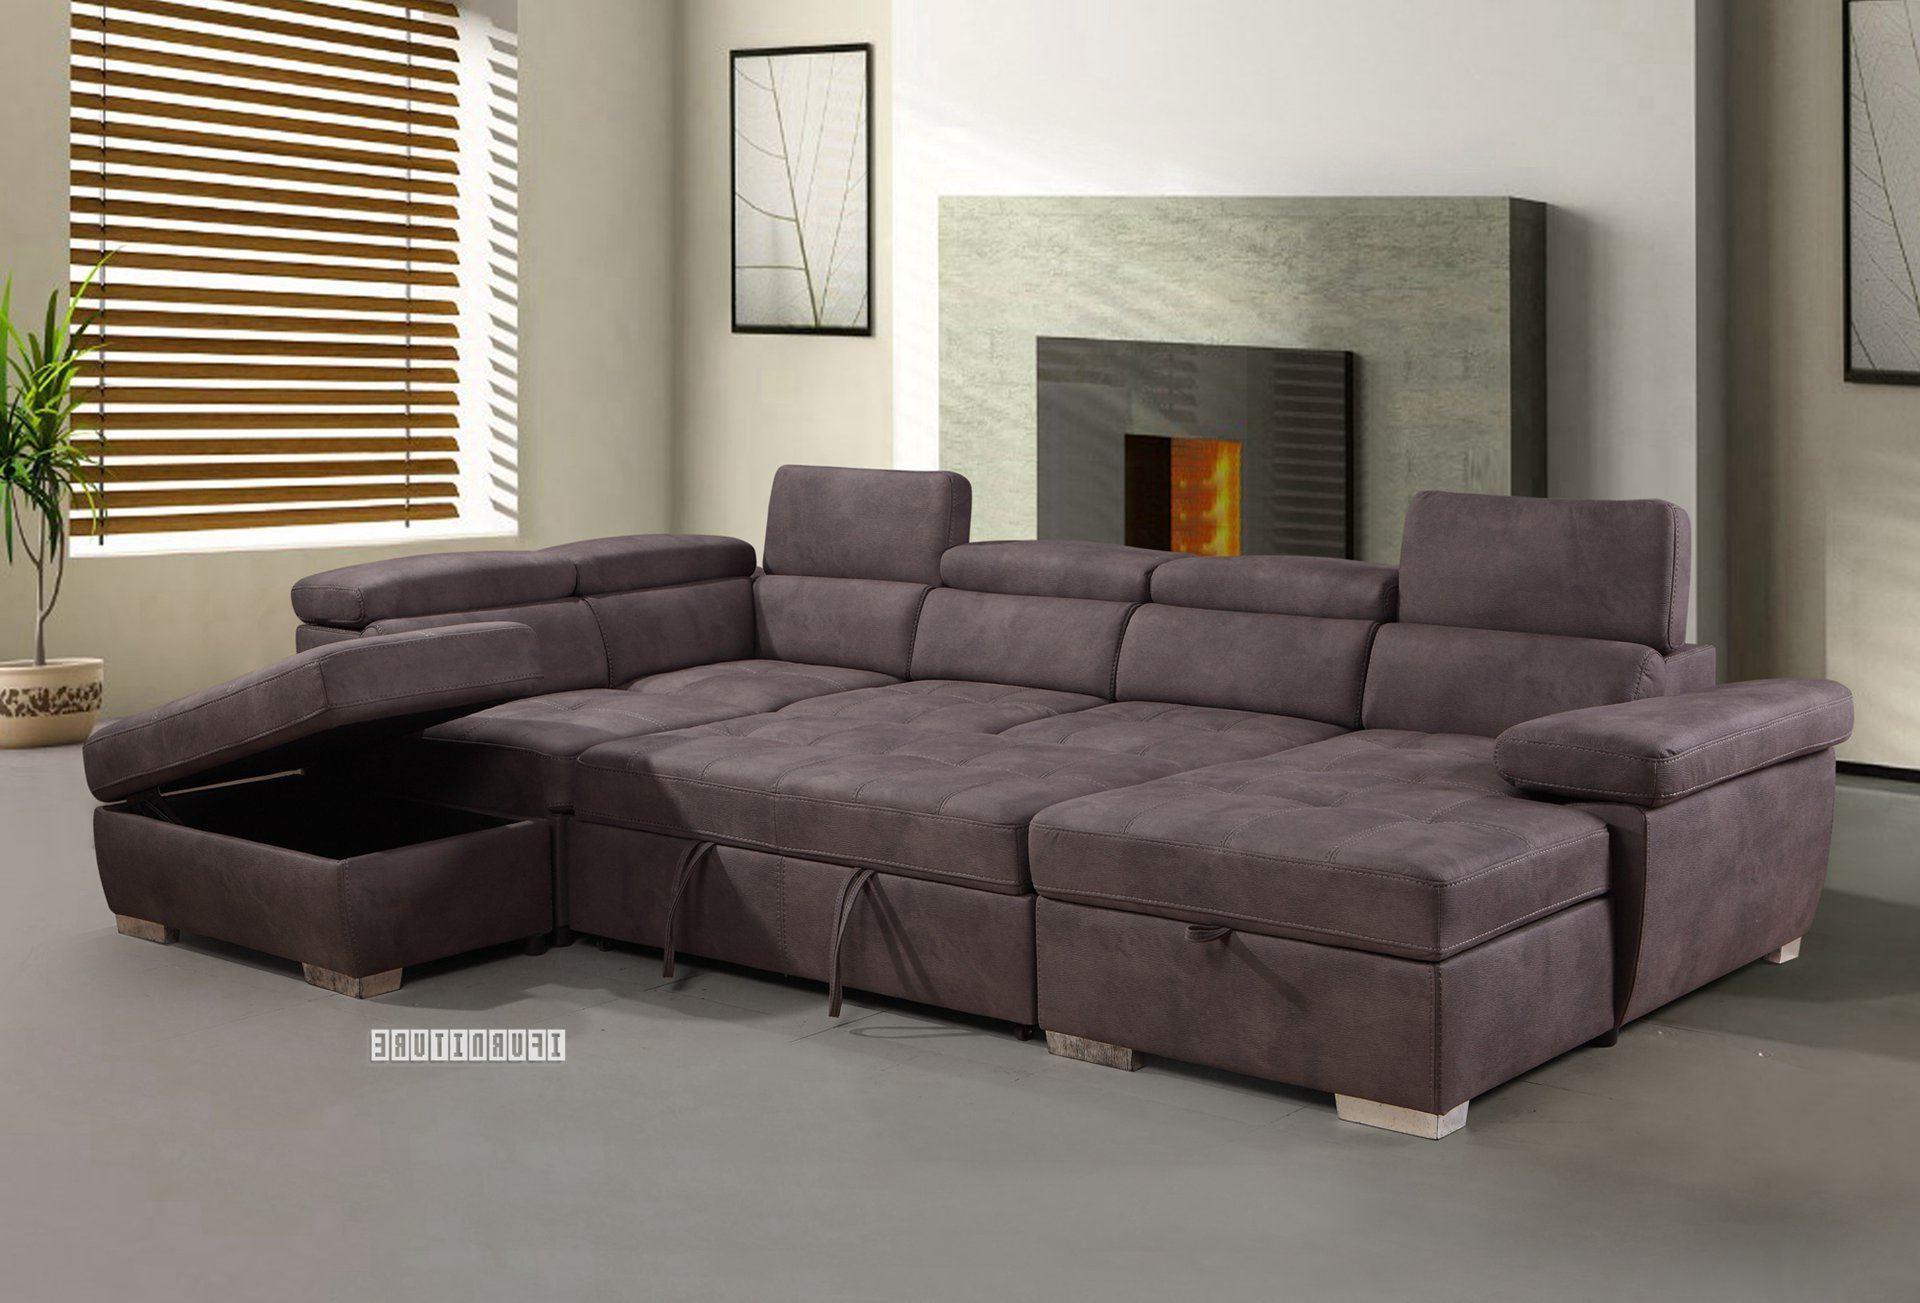 Most Popular Amando Sectional Sofa/ Sofa Bed With Storage *Titanium Grey Throughout Hartford Storage Sectional Futon Sofas (View 12 of 25)